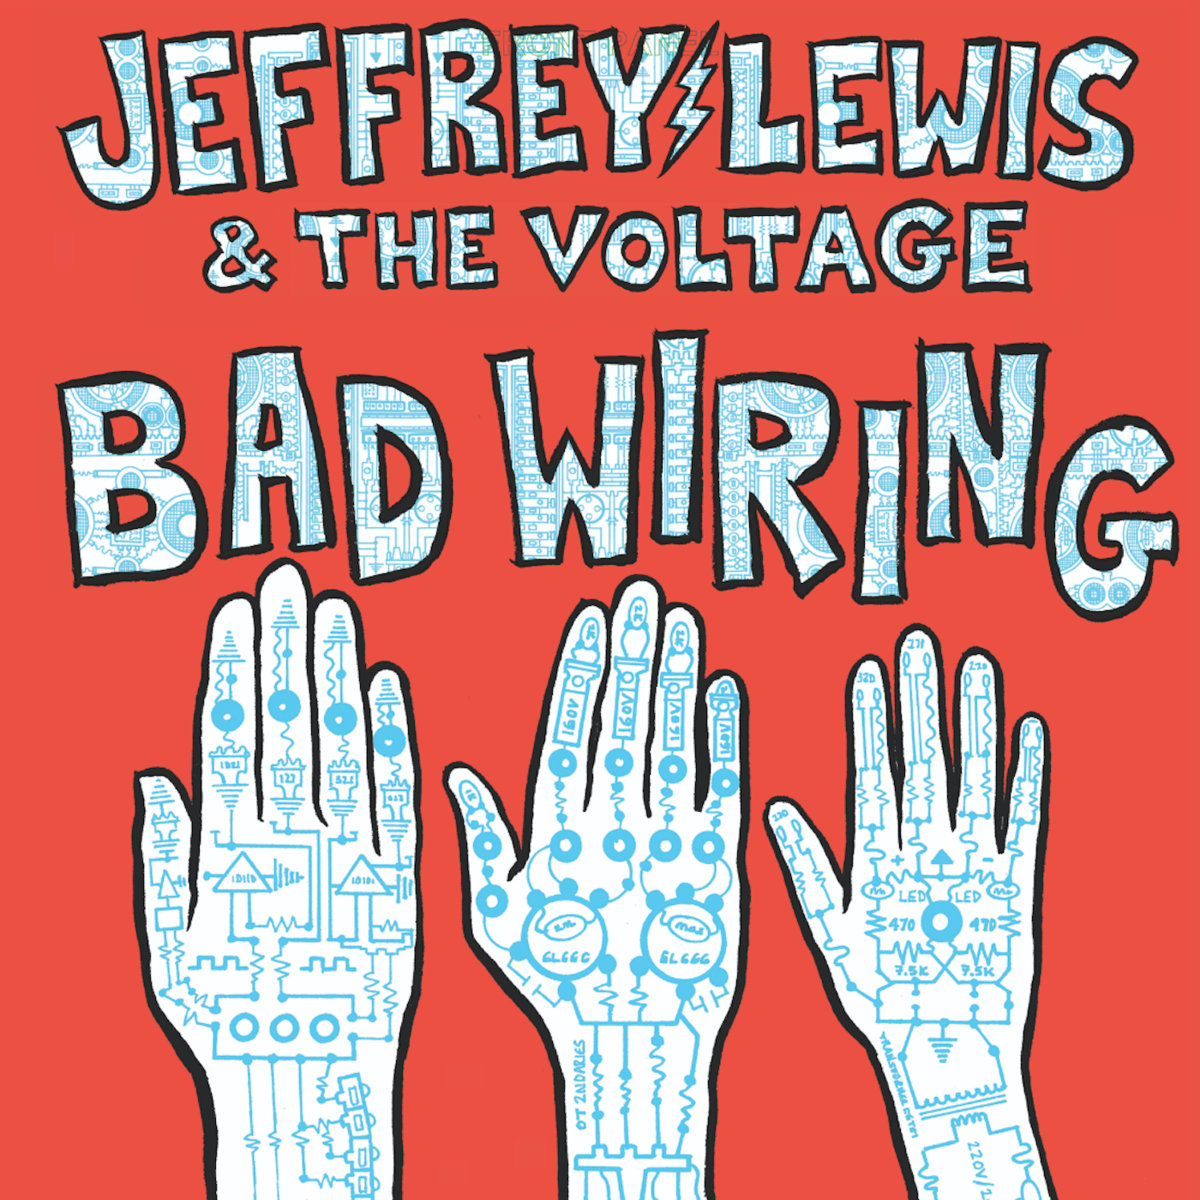 1 Jeffrey Lewis